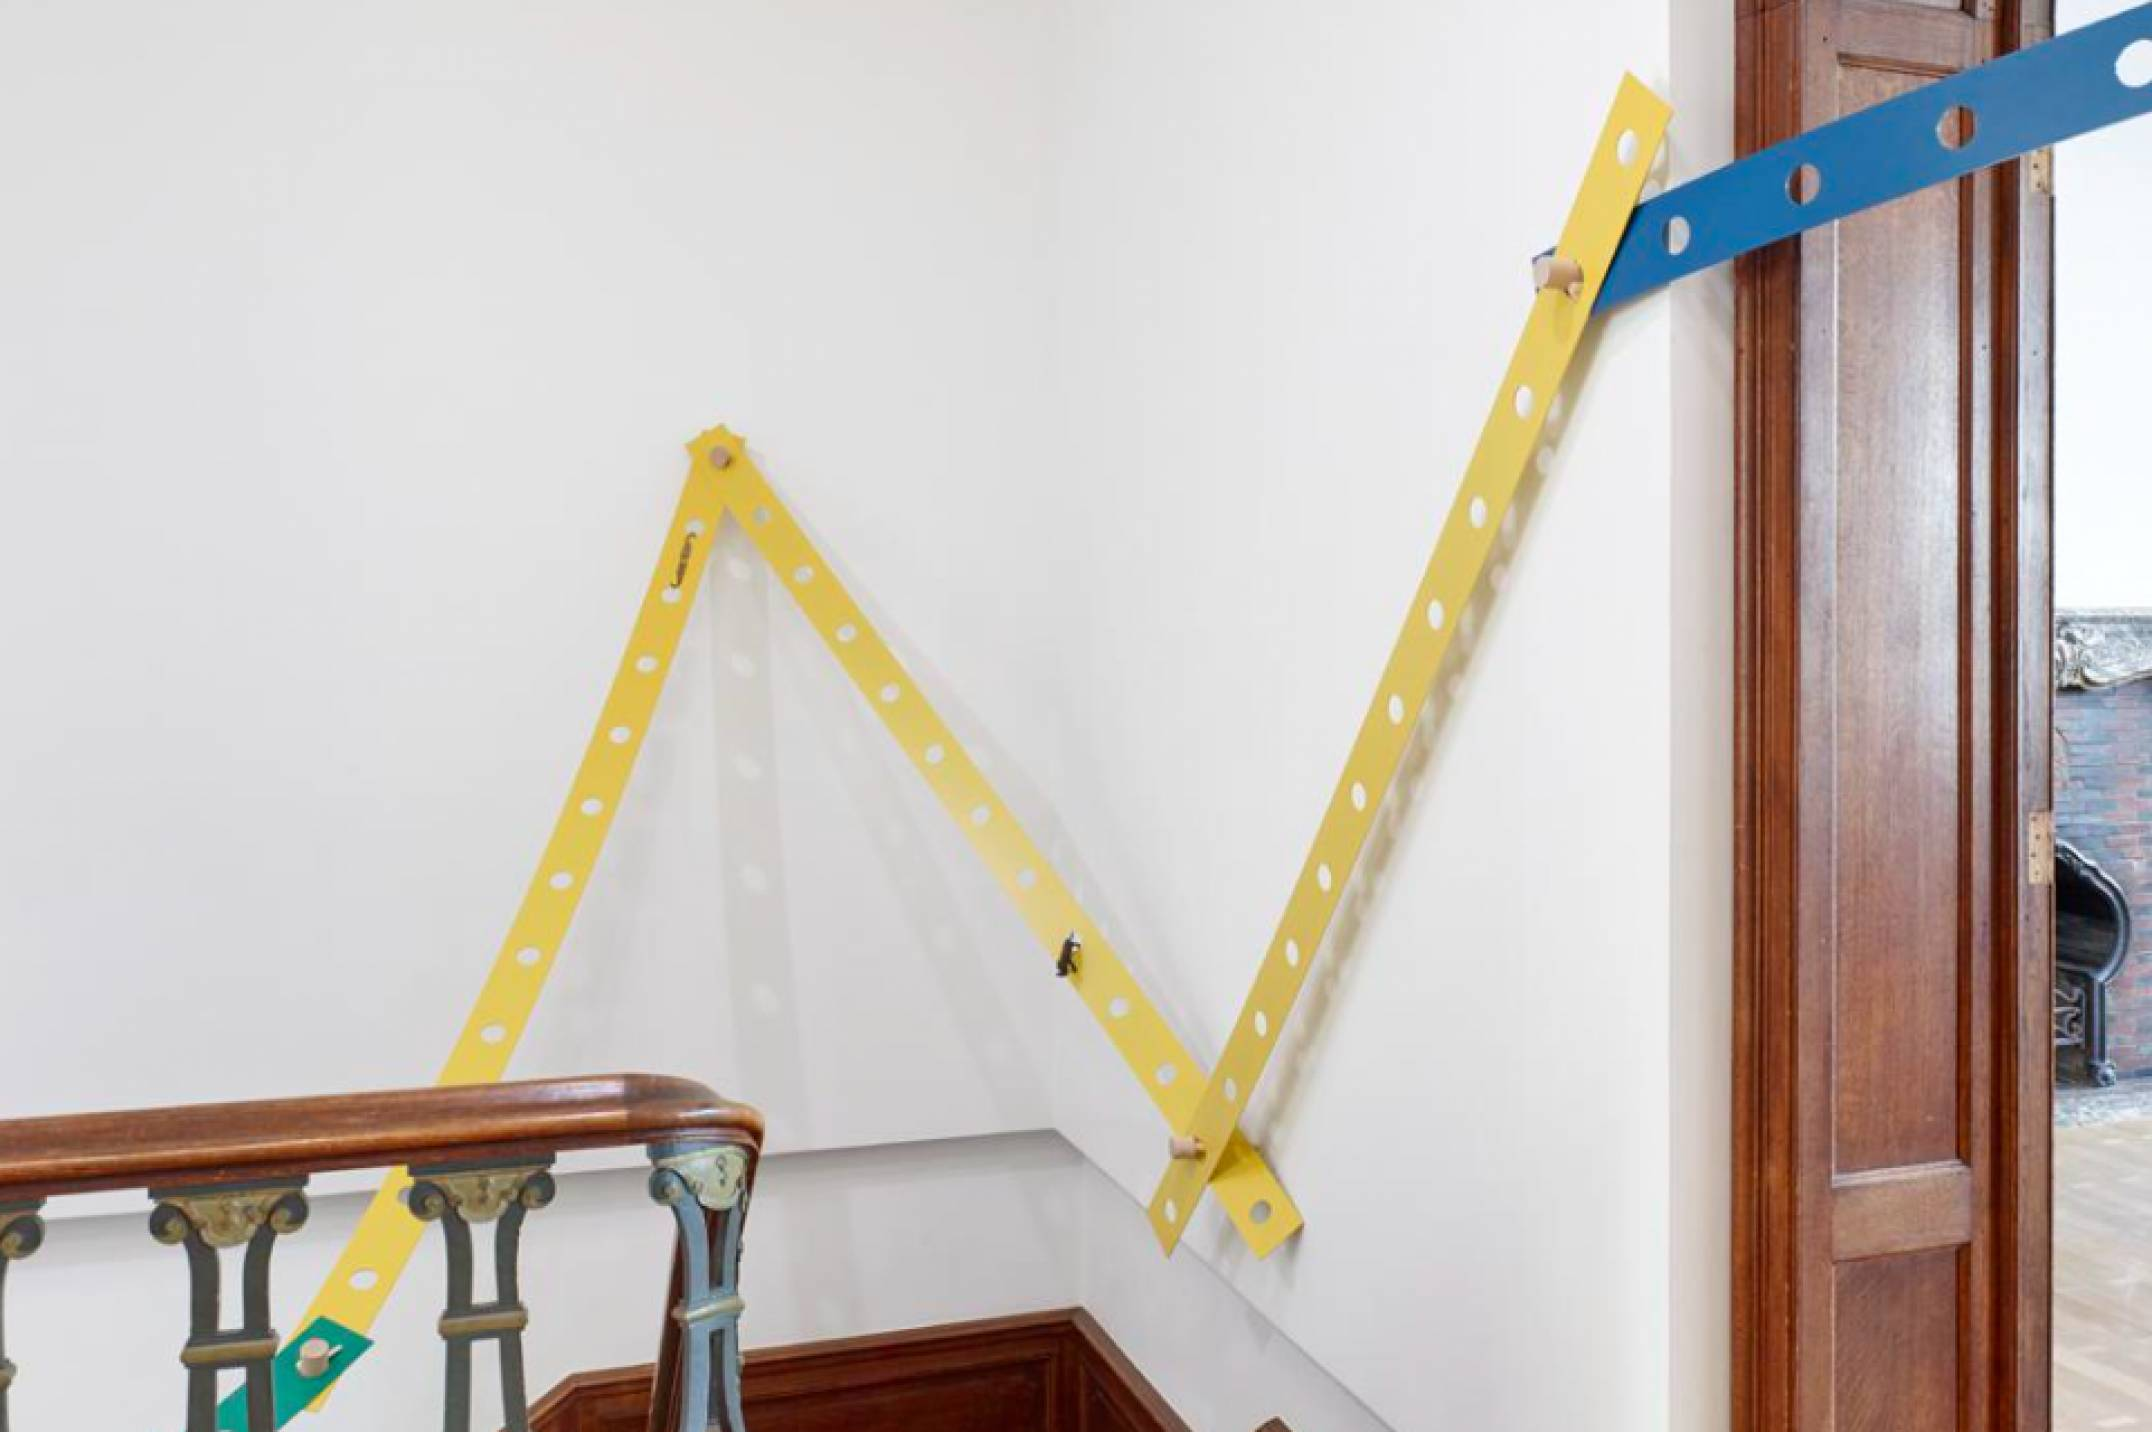 Mariana Castillo Deball, <em>Tonalpohualli Petate</em>, 2017, aluminum, wood, bronze, variable dimensions, 270 × 12 × 0,3 cm (each strip) - Mendes Wood DM